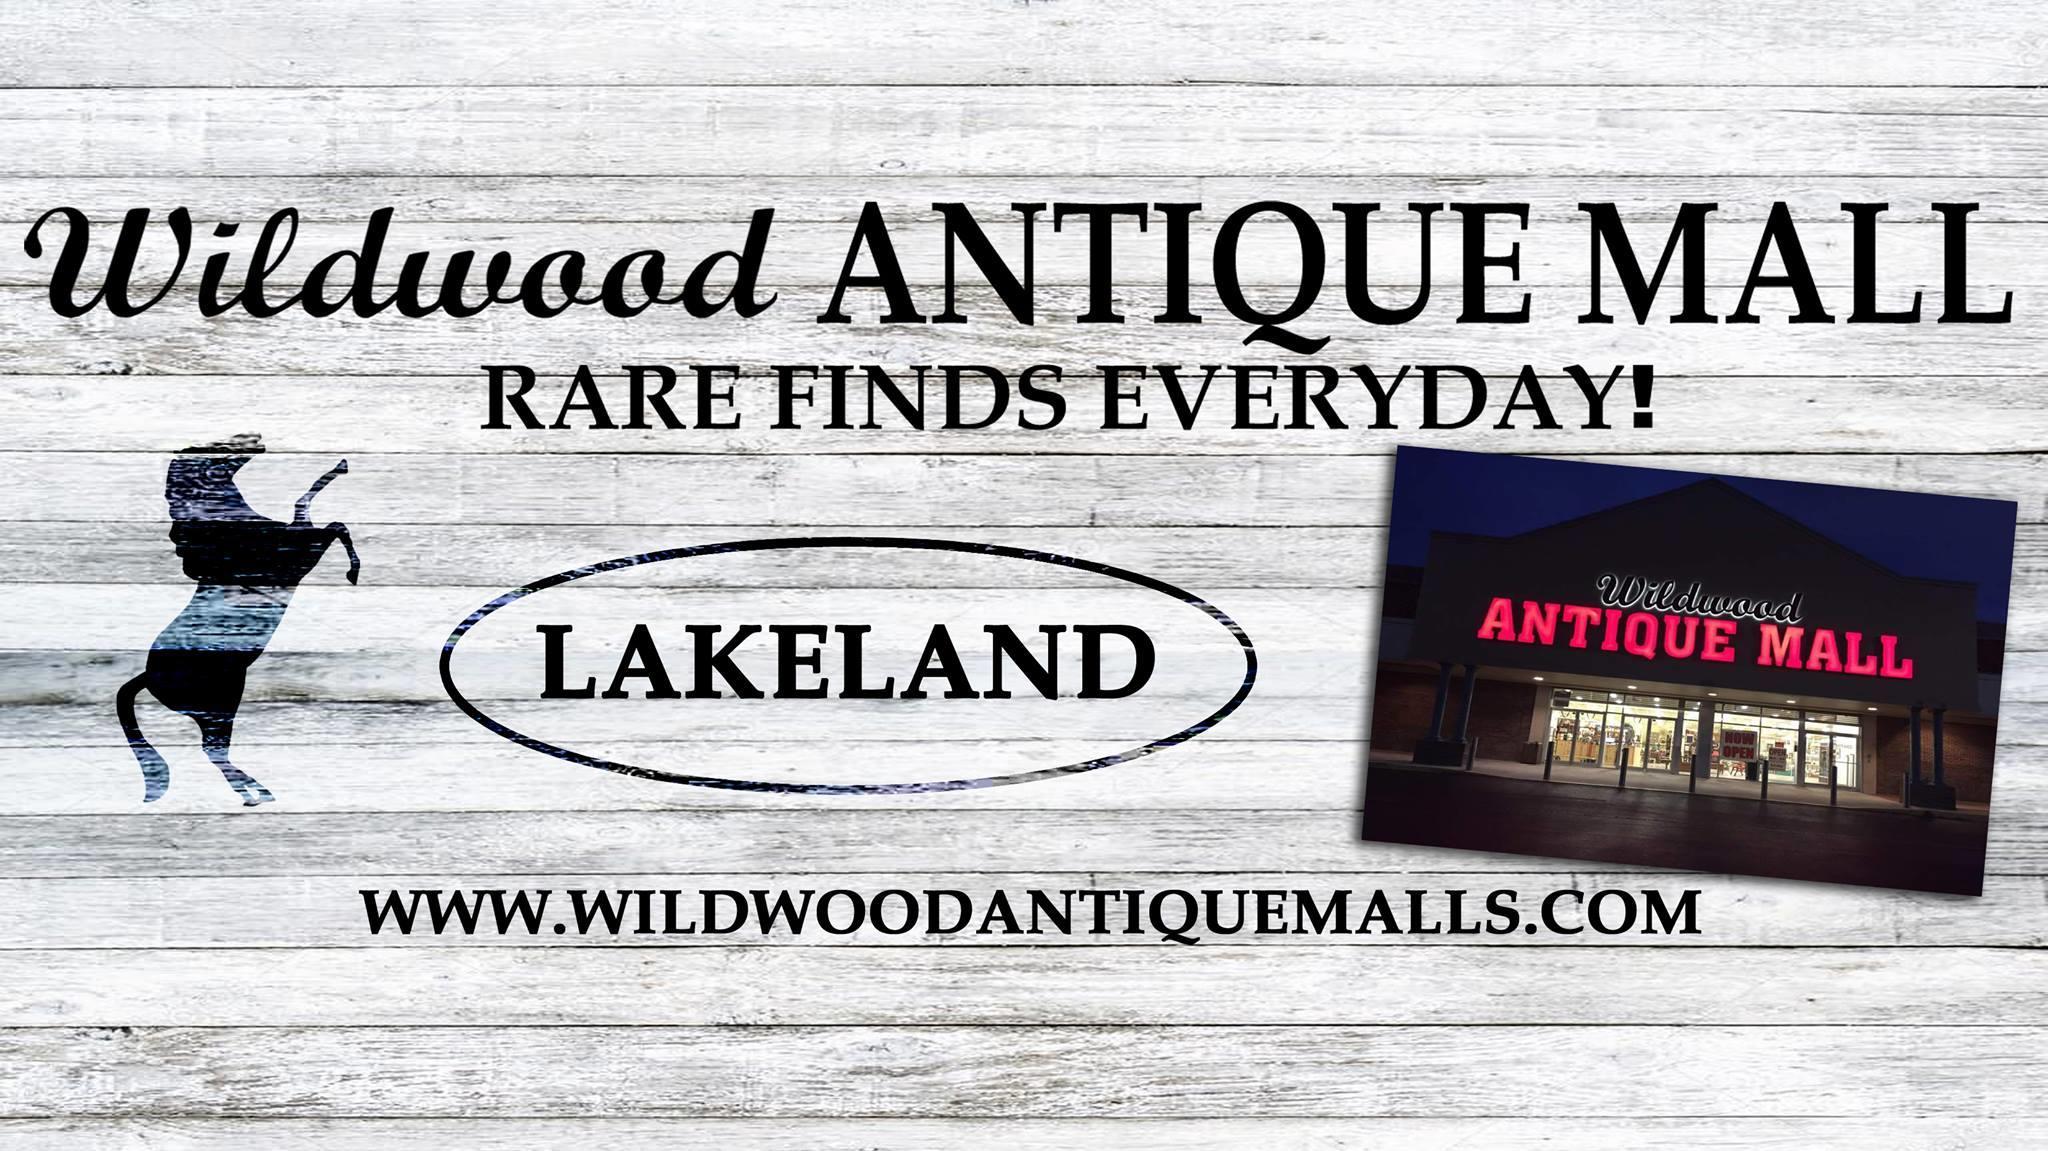 Wildwood Antique Mall of Lakeland image 0